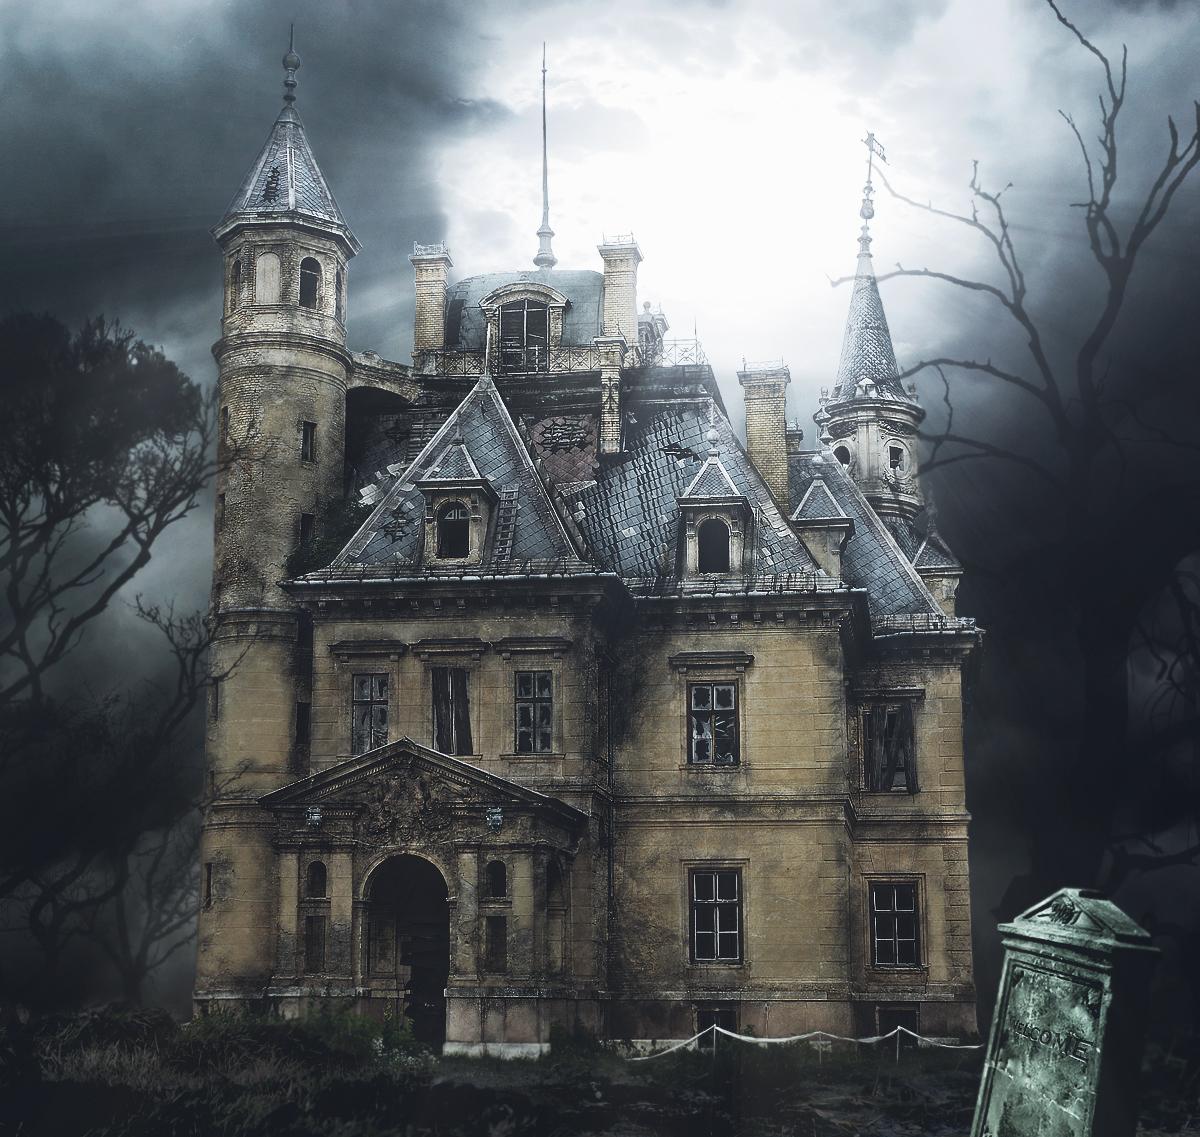 Spooky Mansion by RiDDiKK